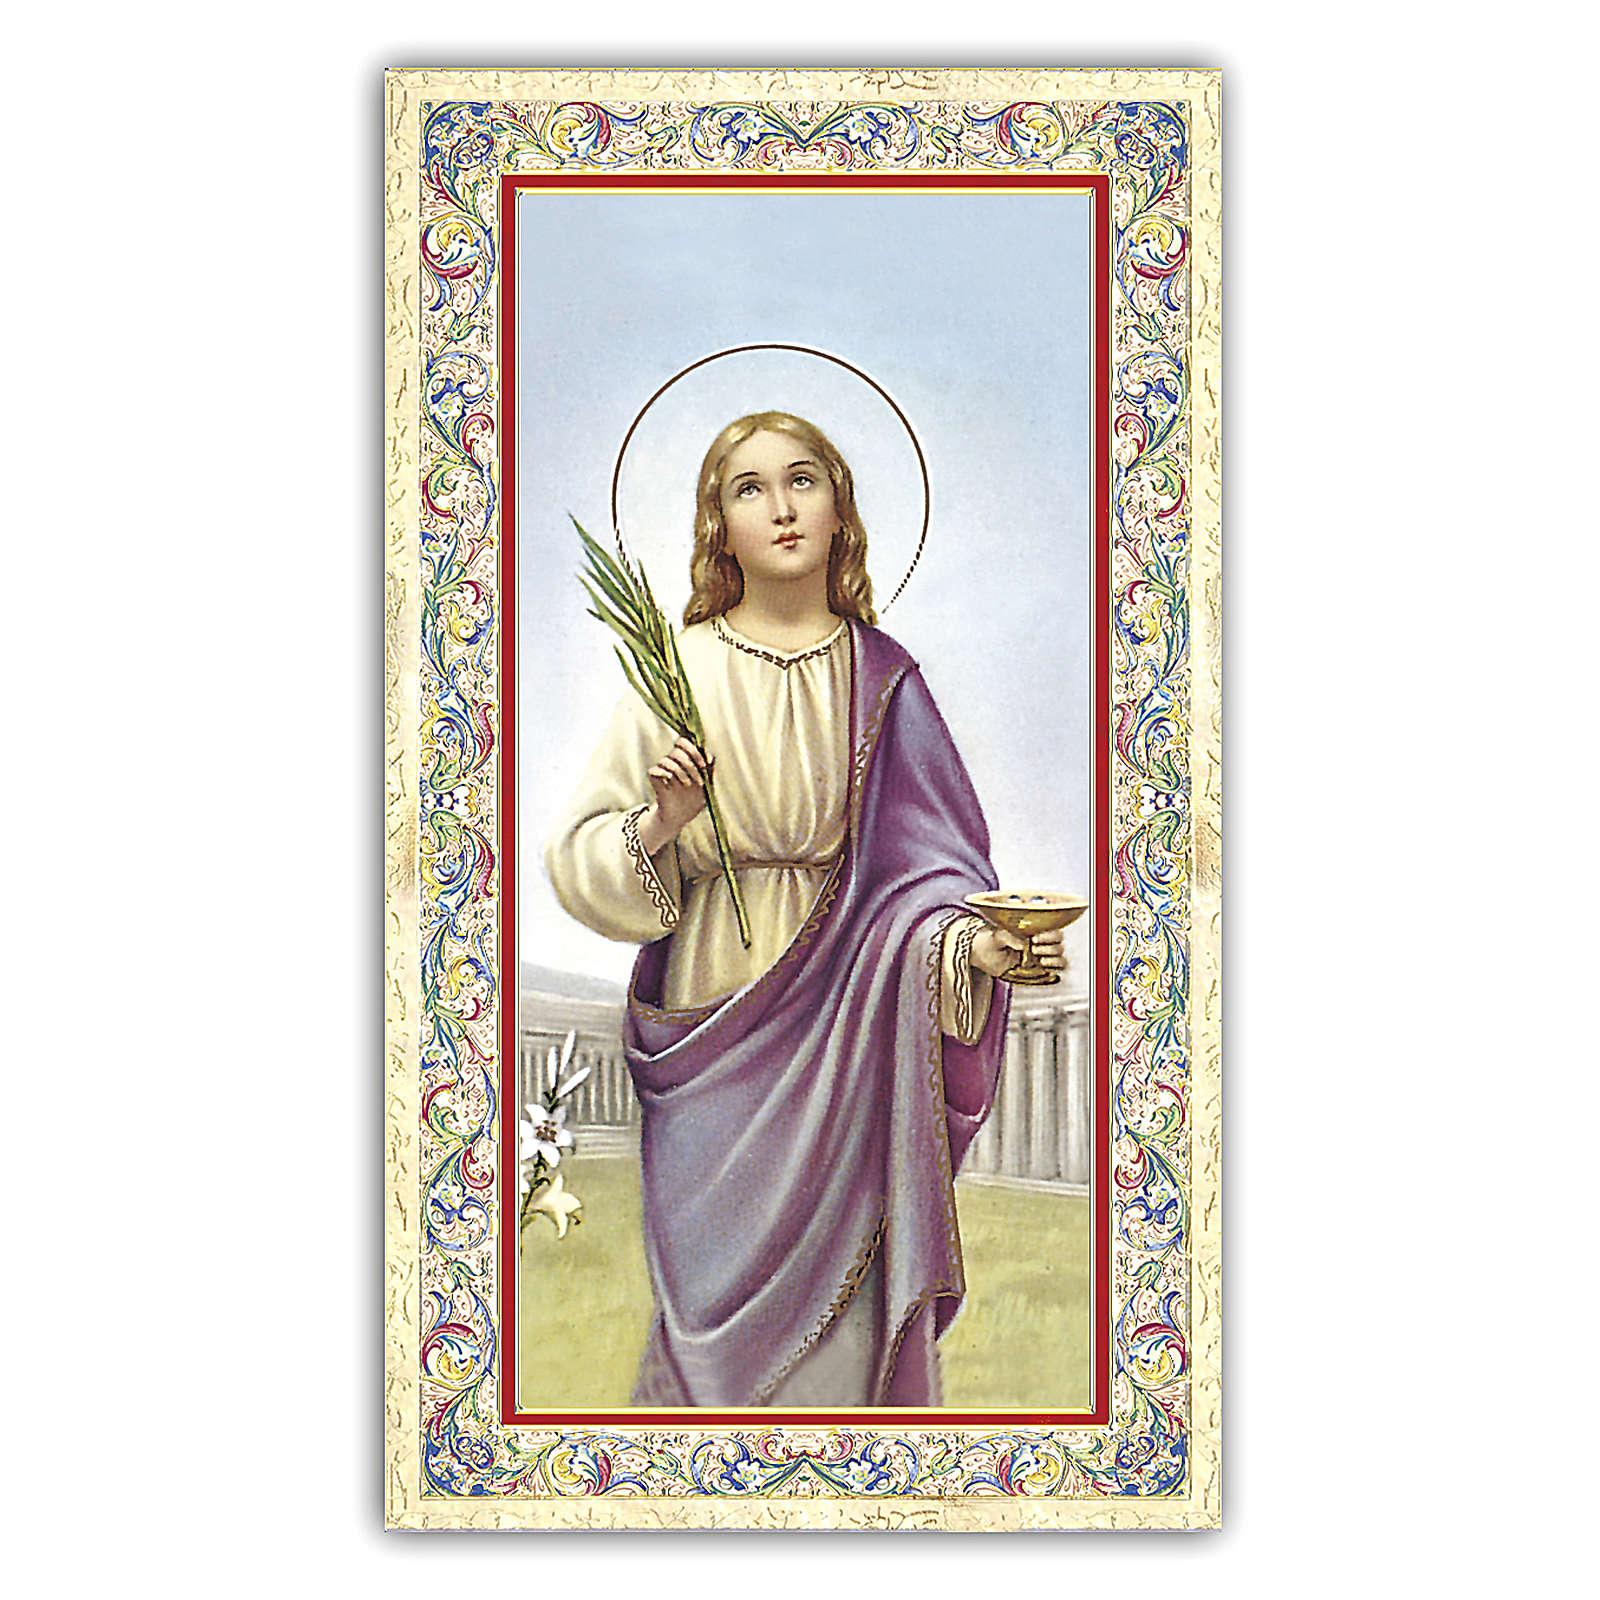 Santino Santa Lucia 10x5 cm ITA 4